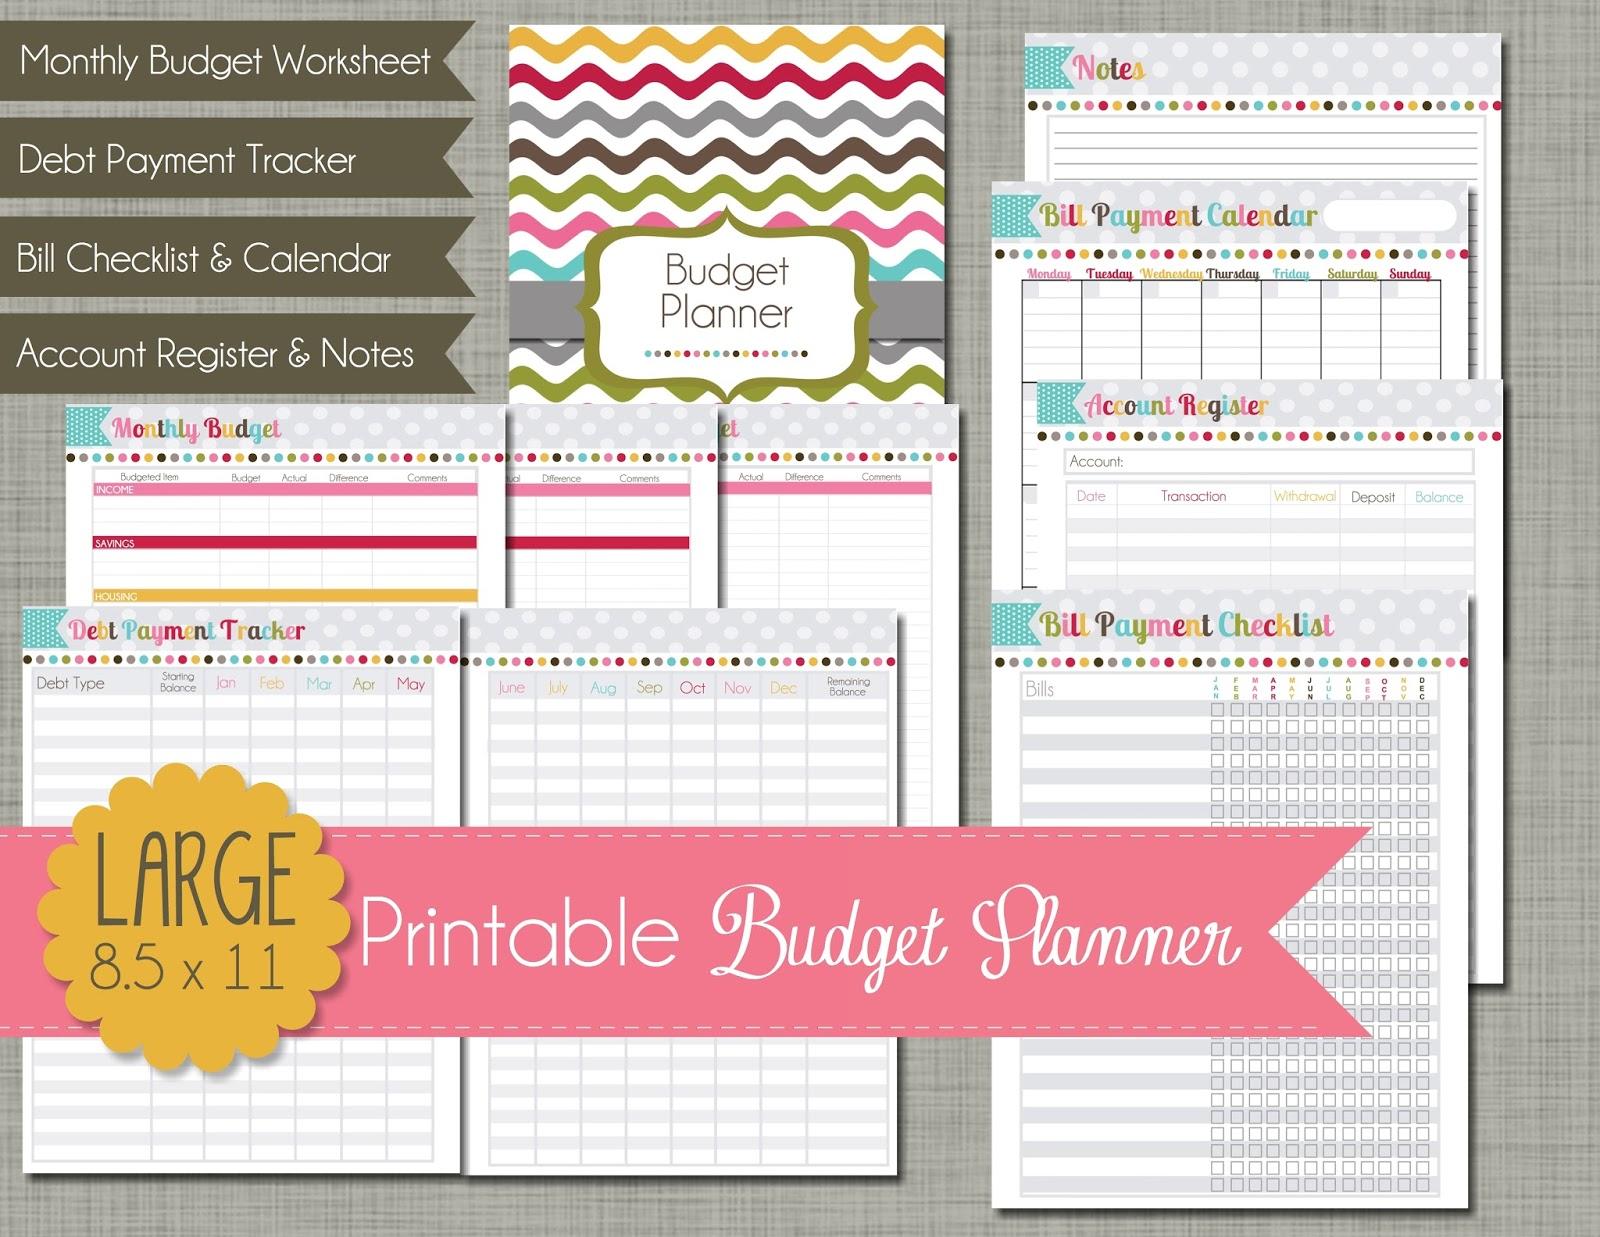 Printable Budget Planner 1